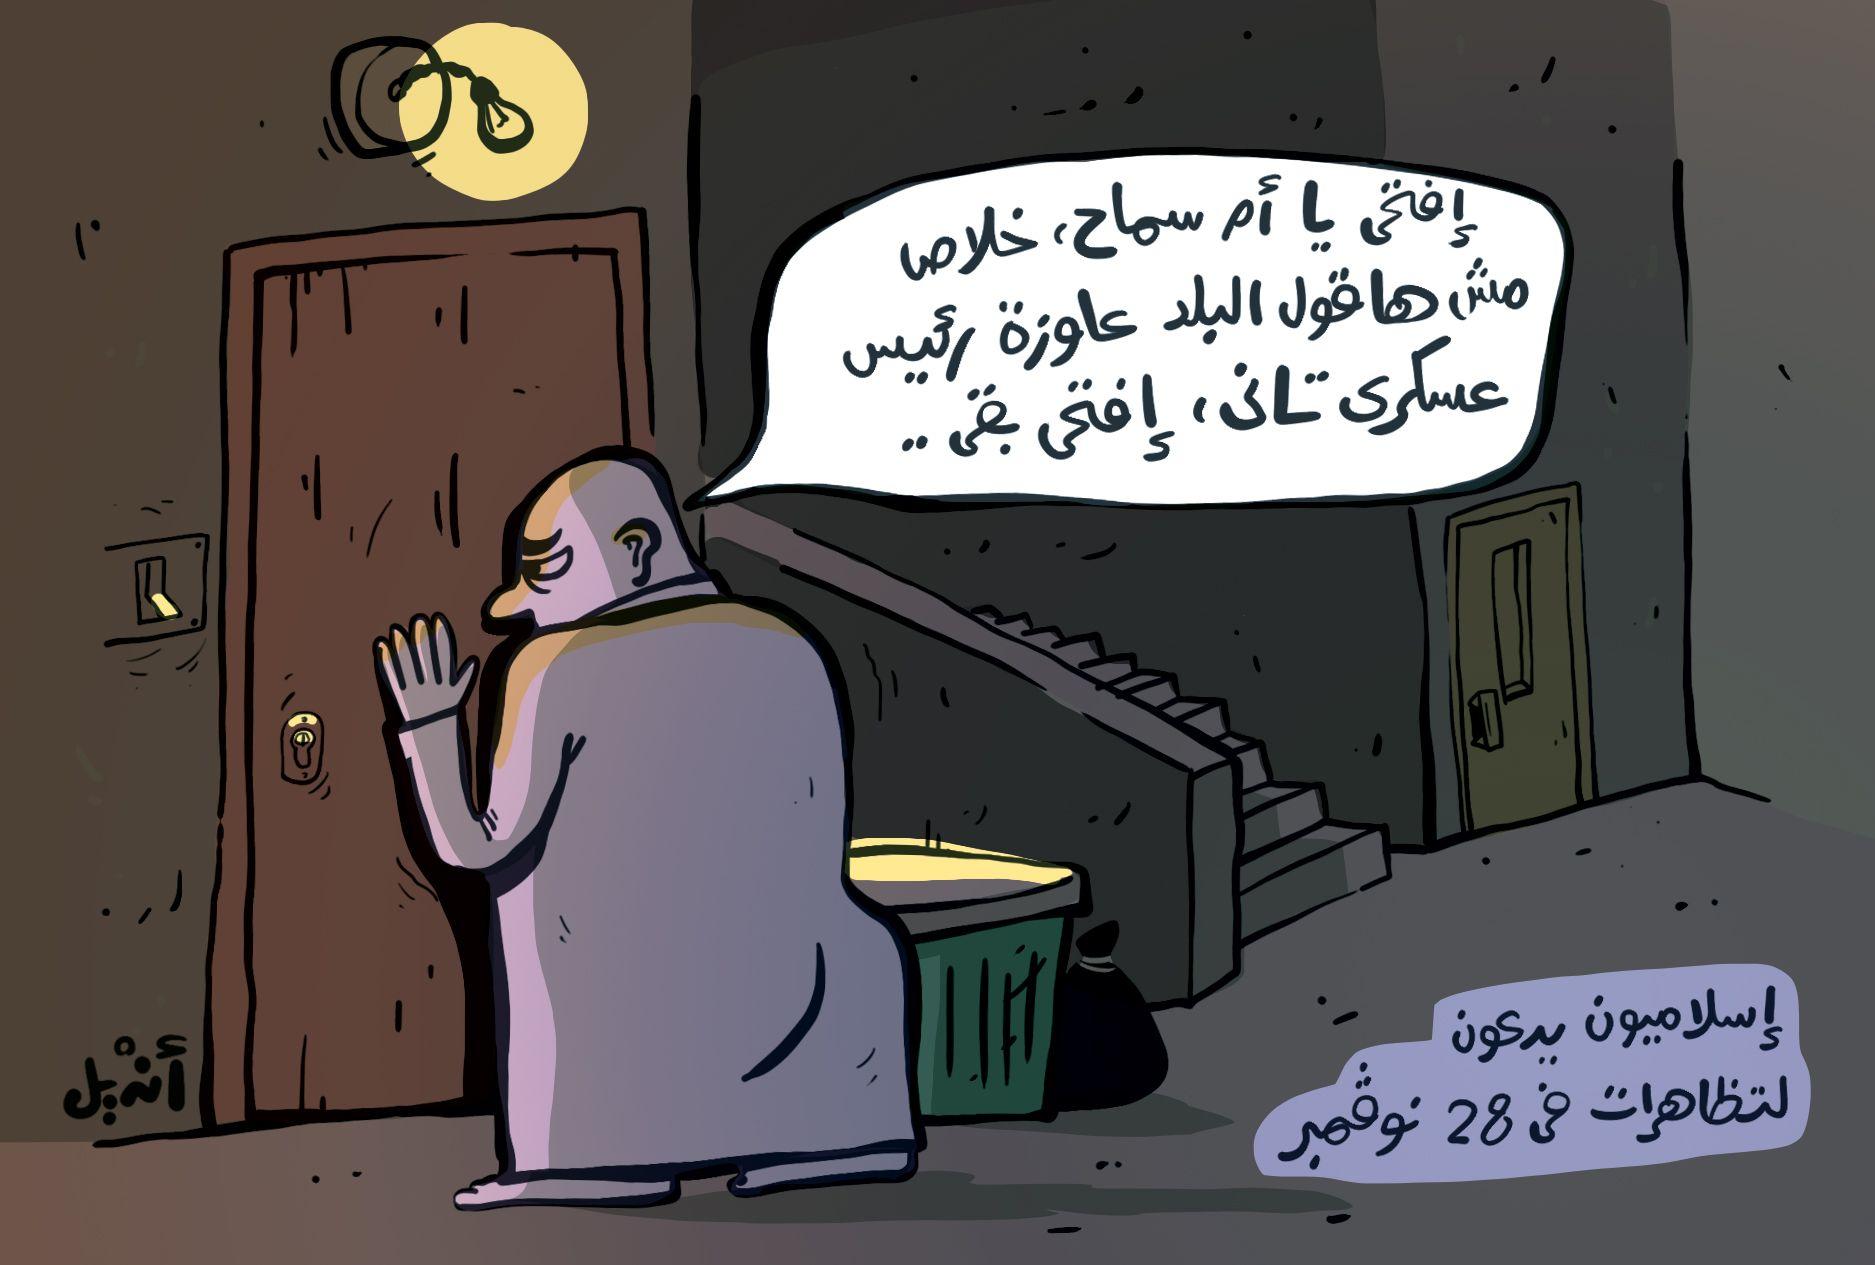 Cartoon: Regret